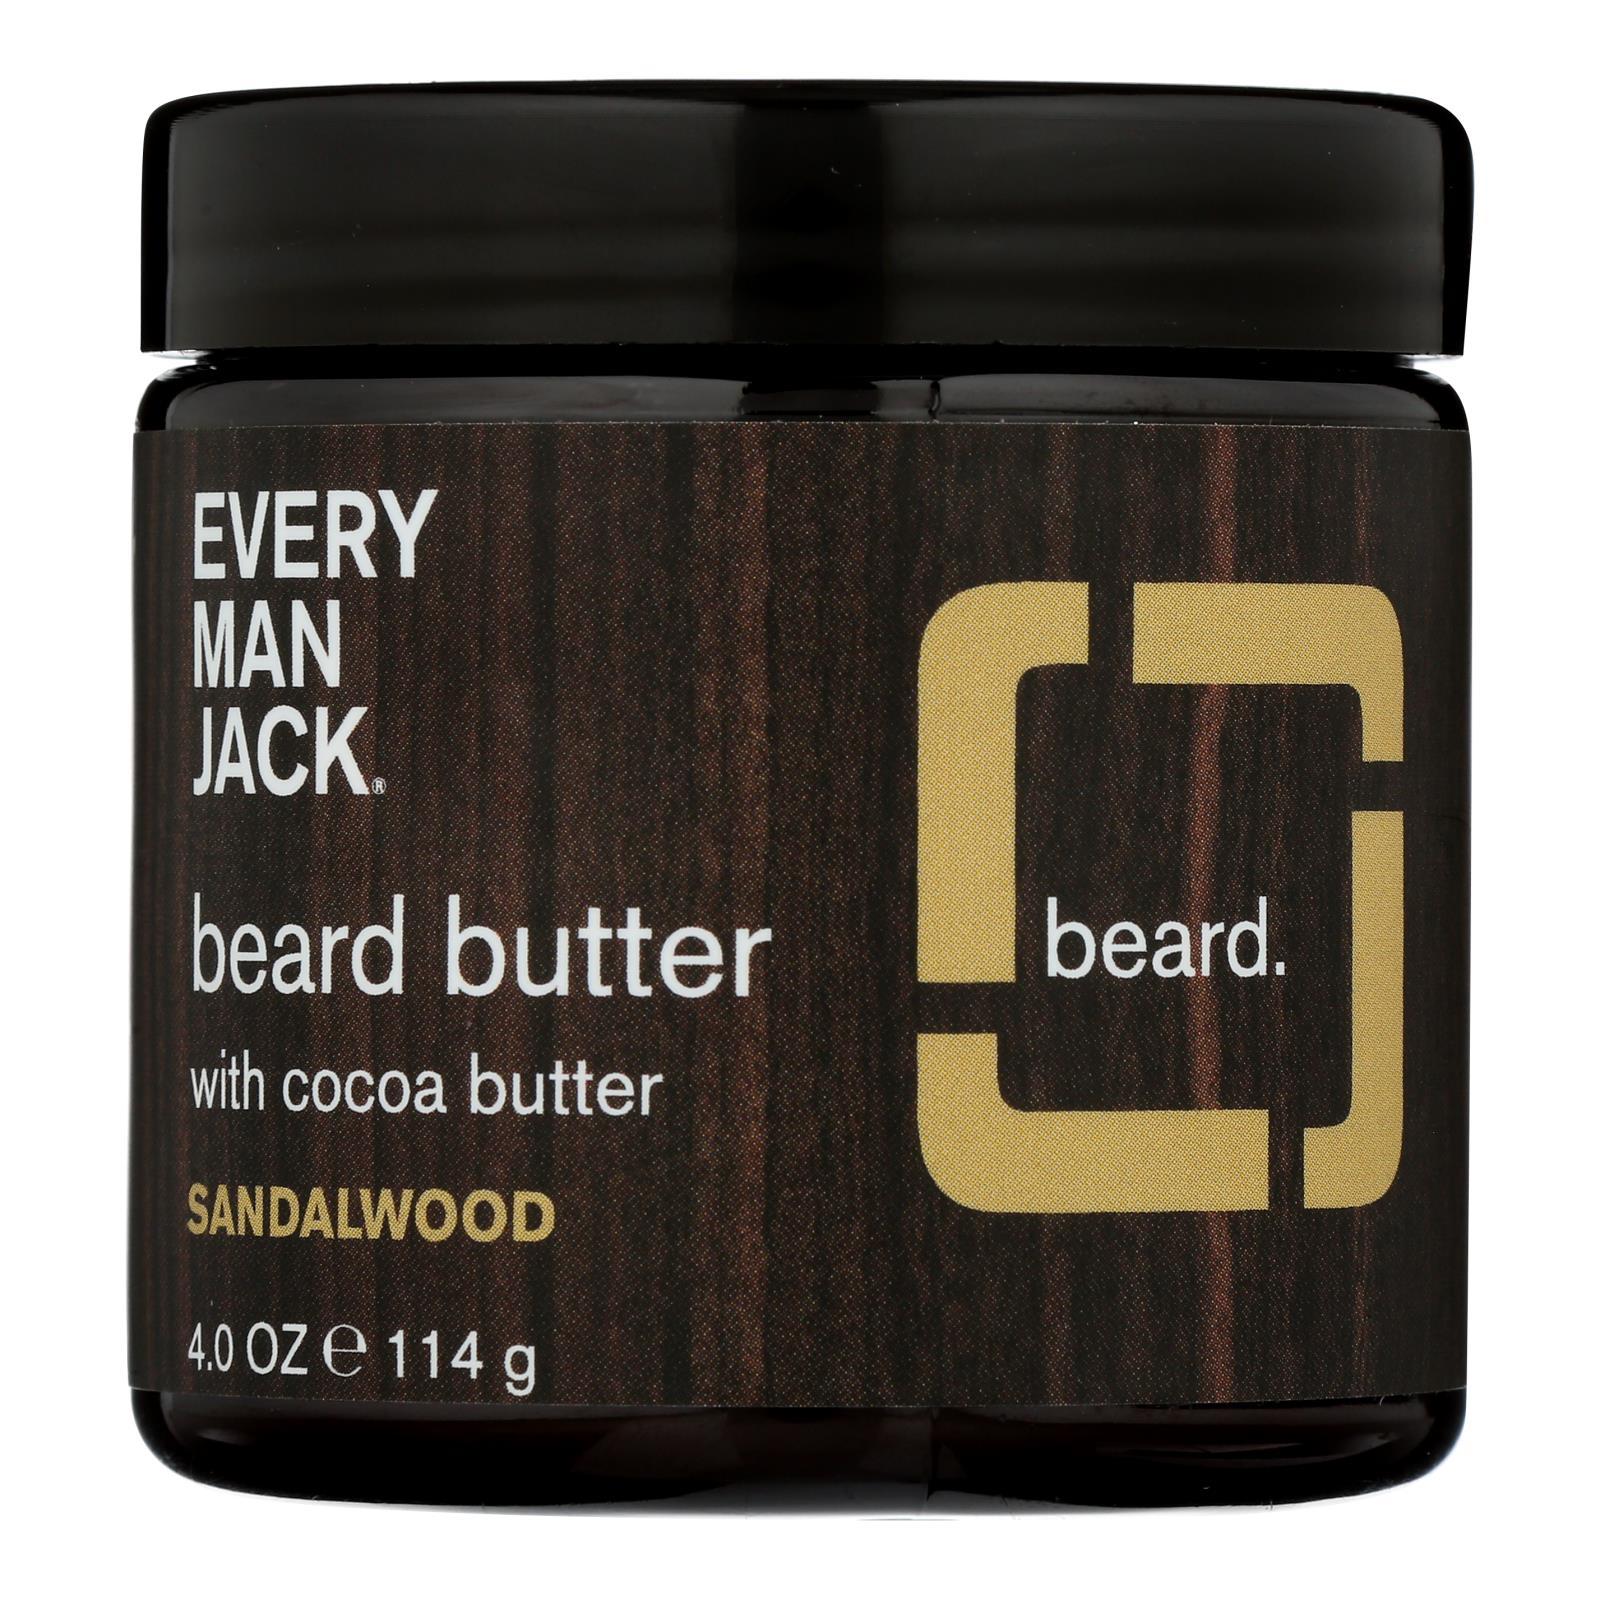 Every Man Jack - Beard Butter Sandalwood - 1 Each - 4 OZ